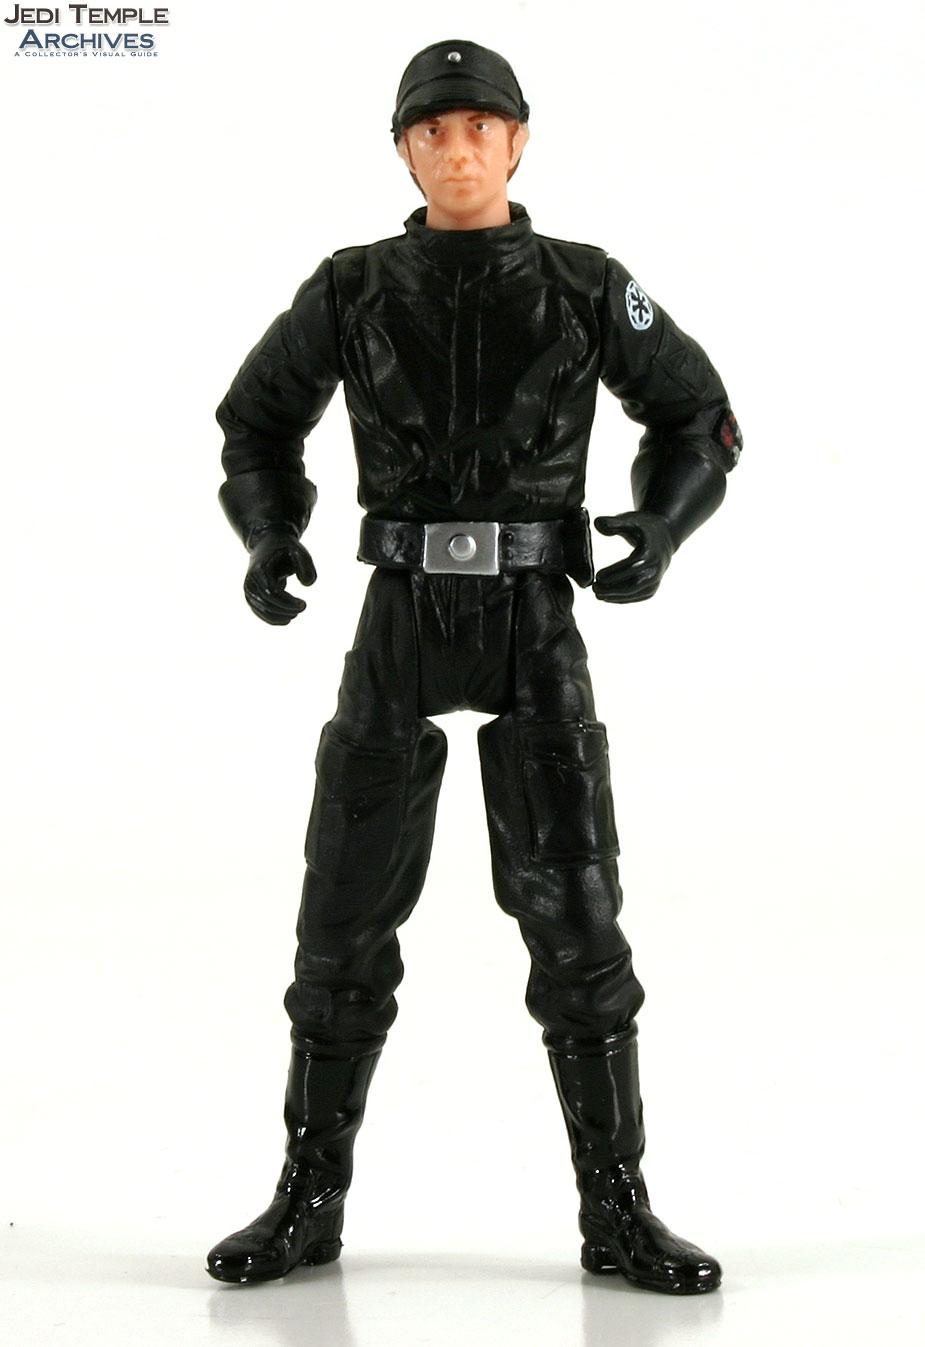 Imperial Officer (brown hair)